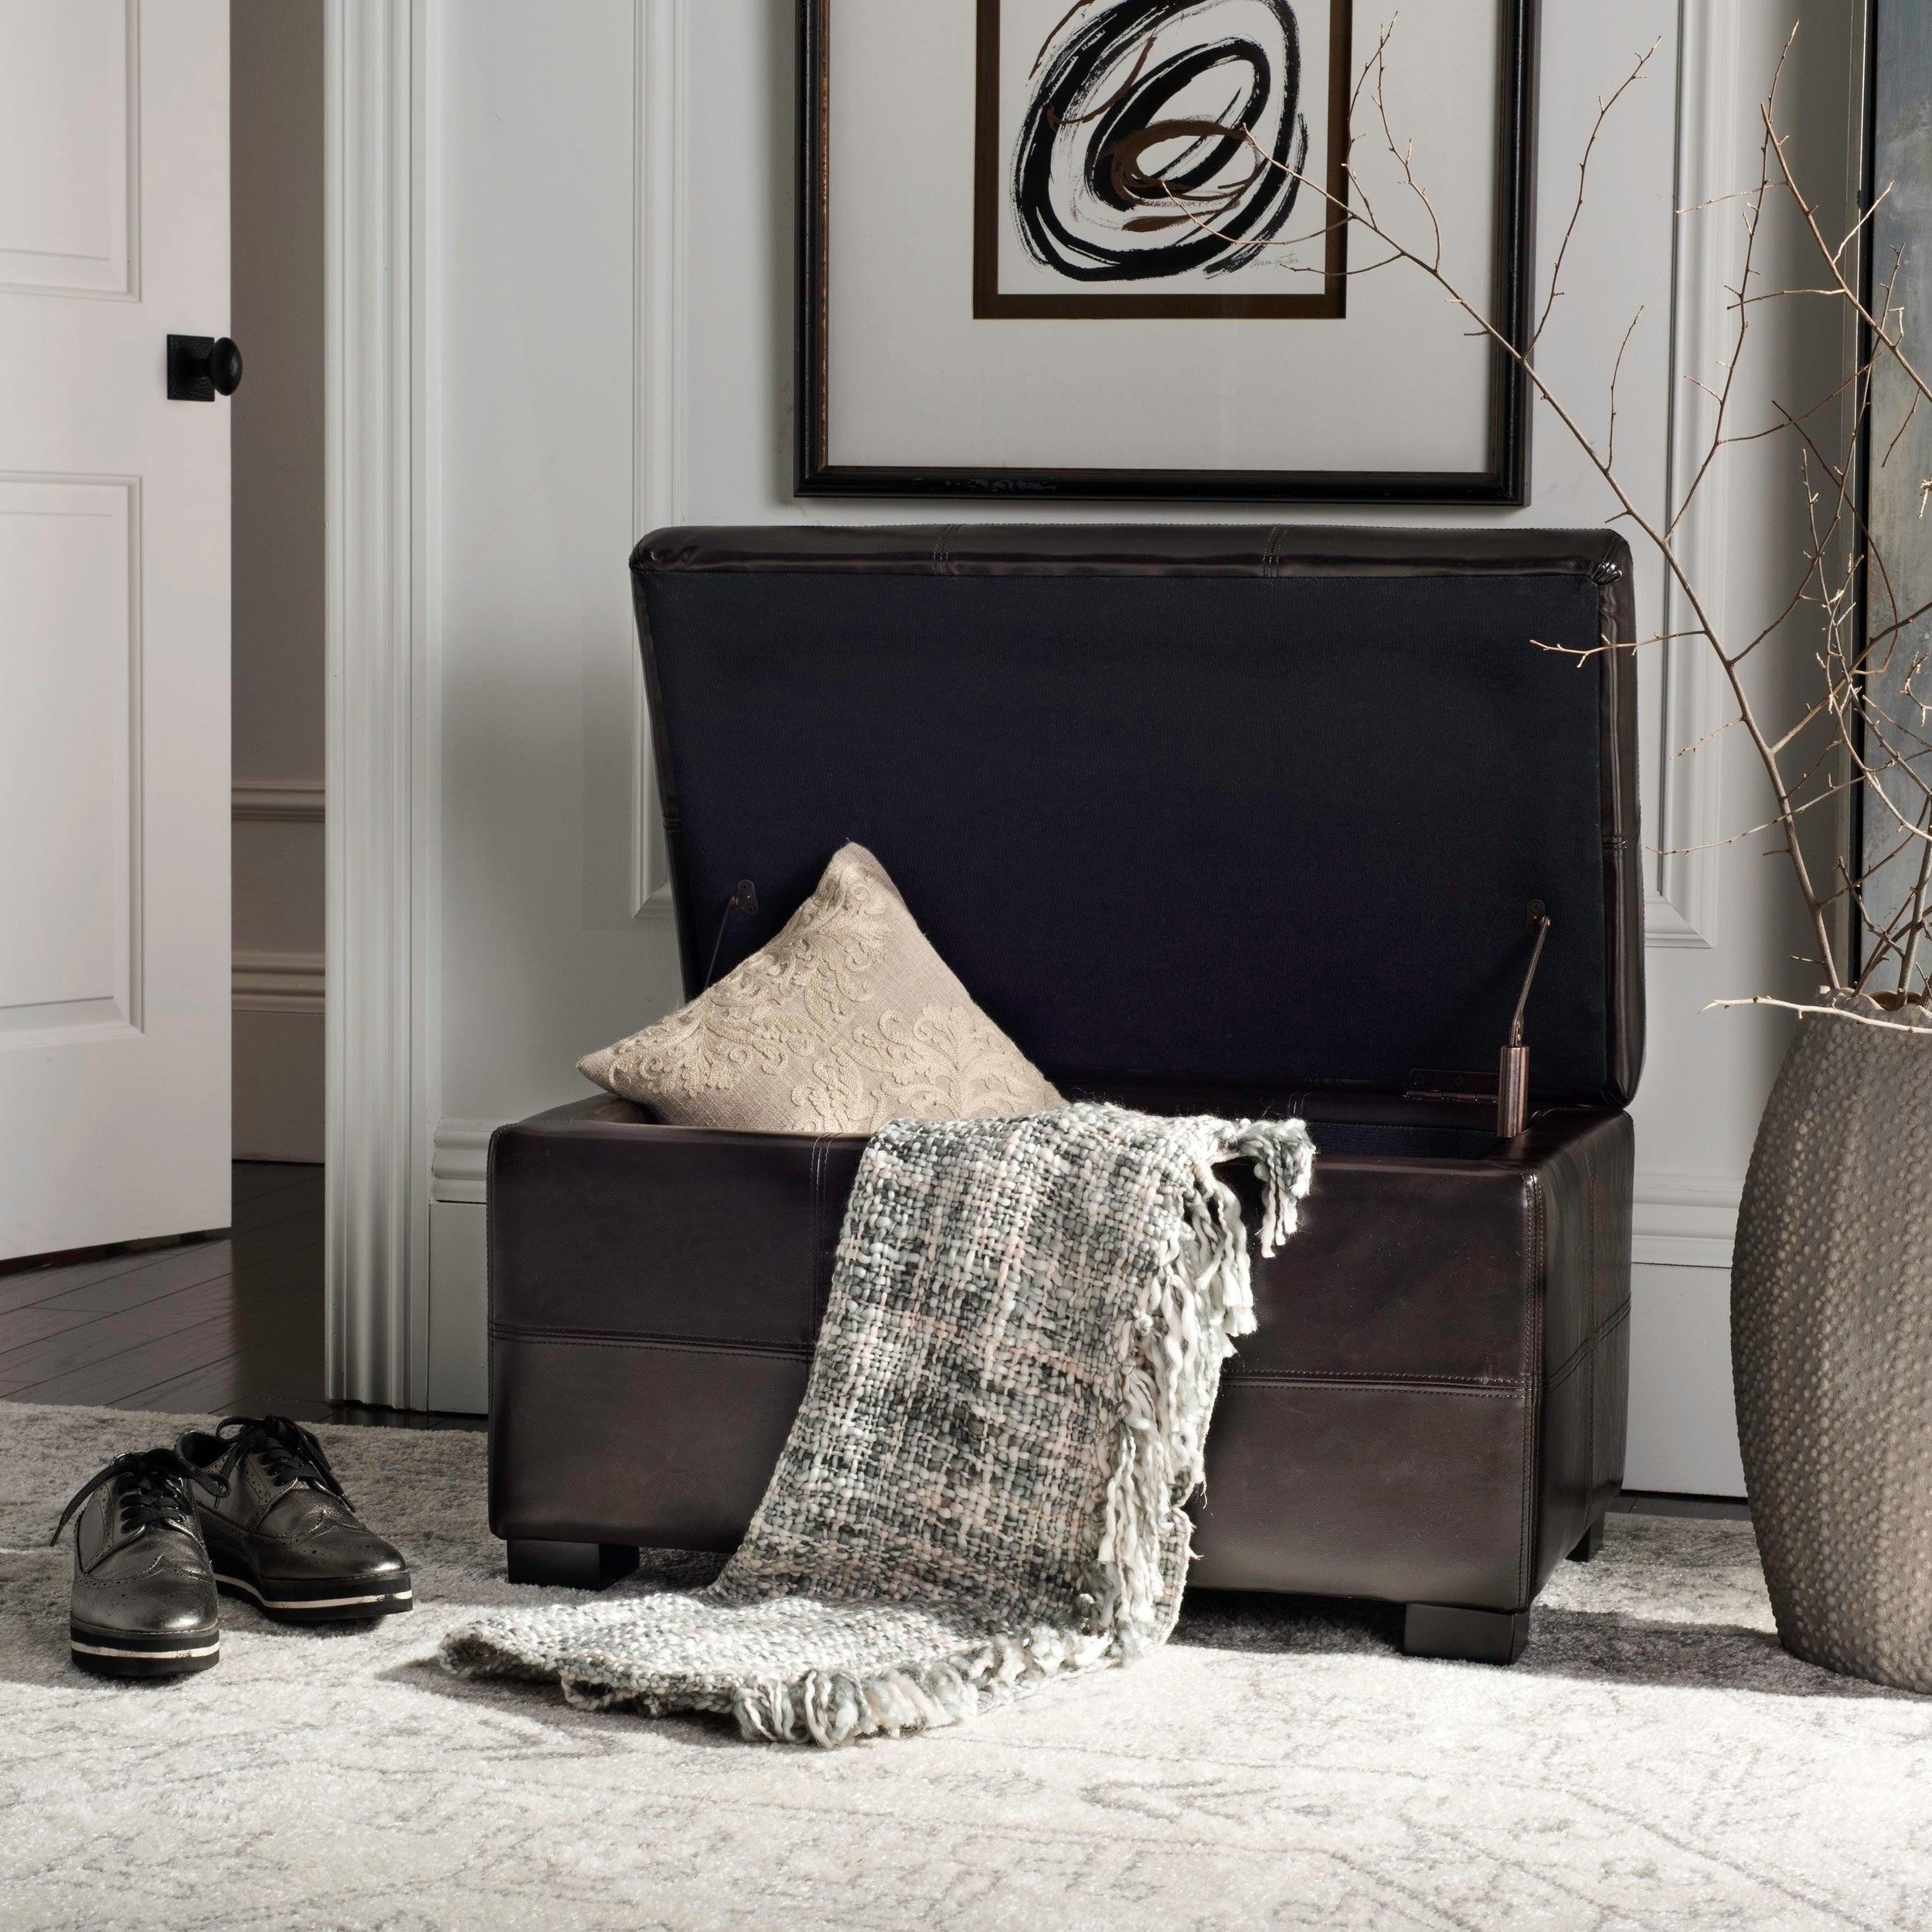 Safavieh Madison Brown Bicast Leather Storage Bench 30 1 X 18 1 X 17 7 Overstock 5151884